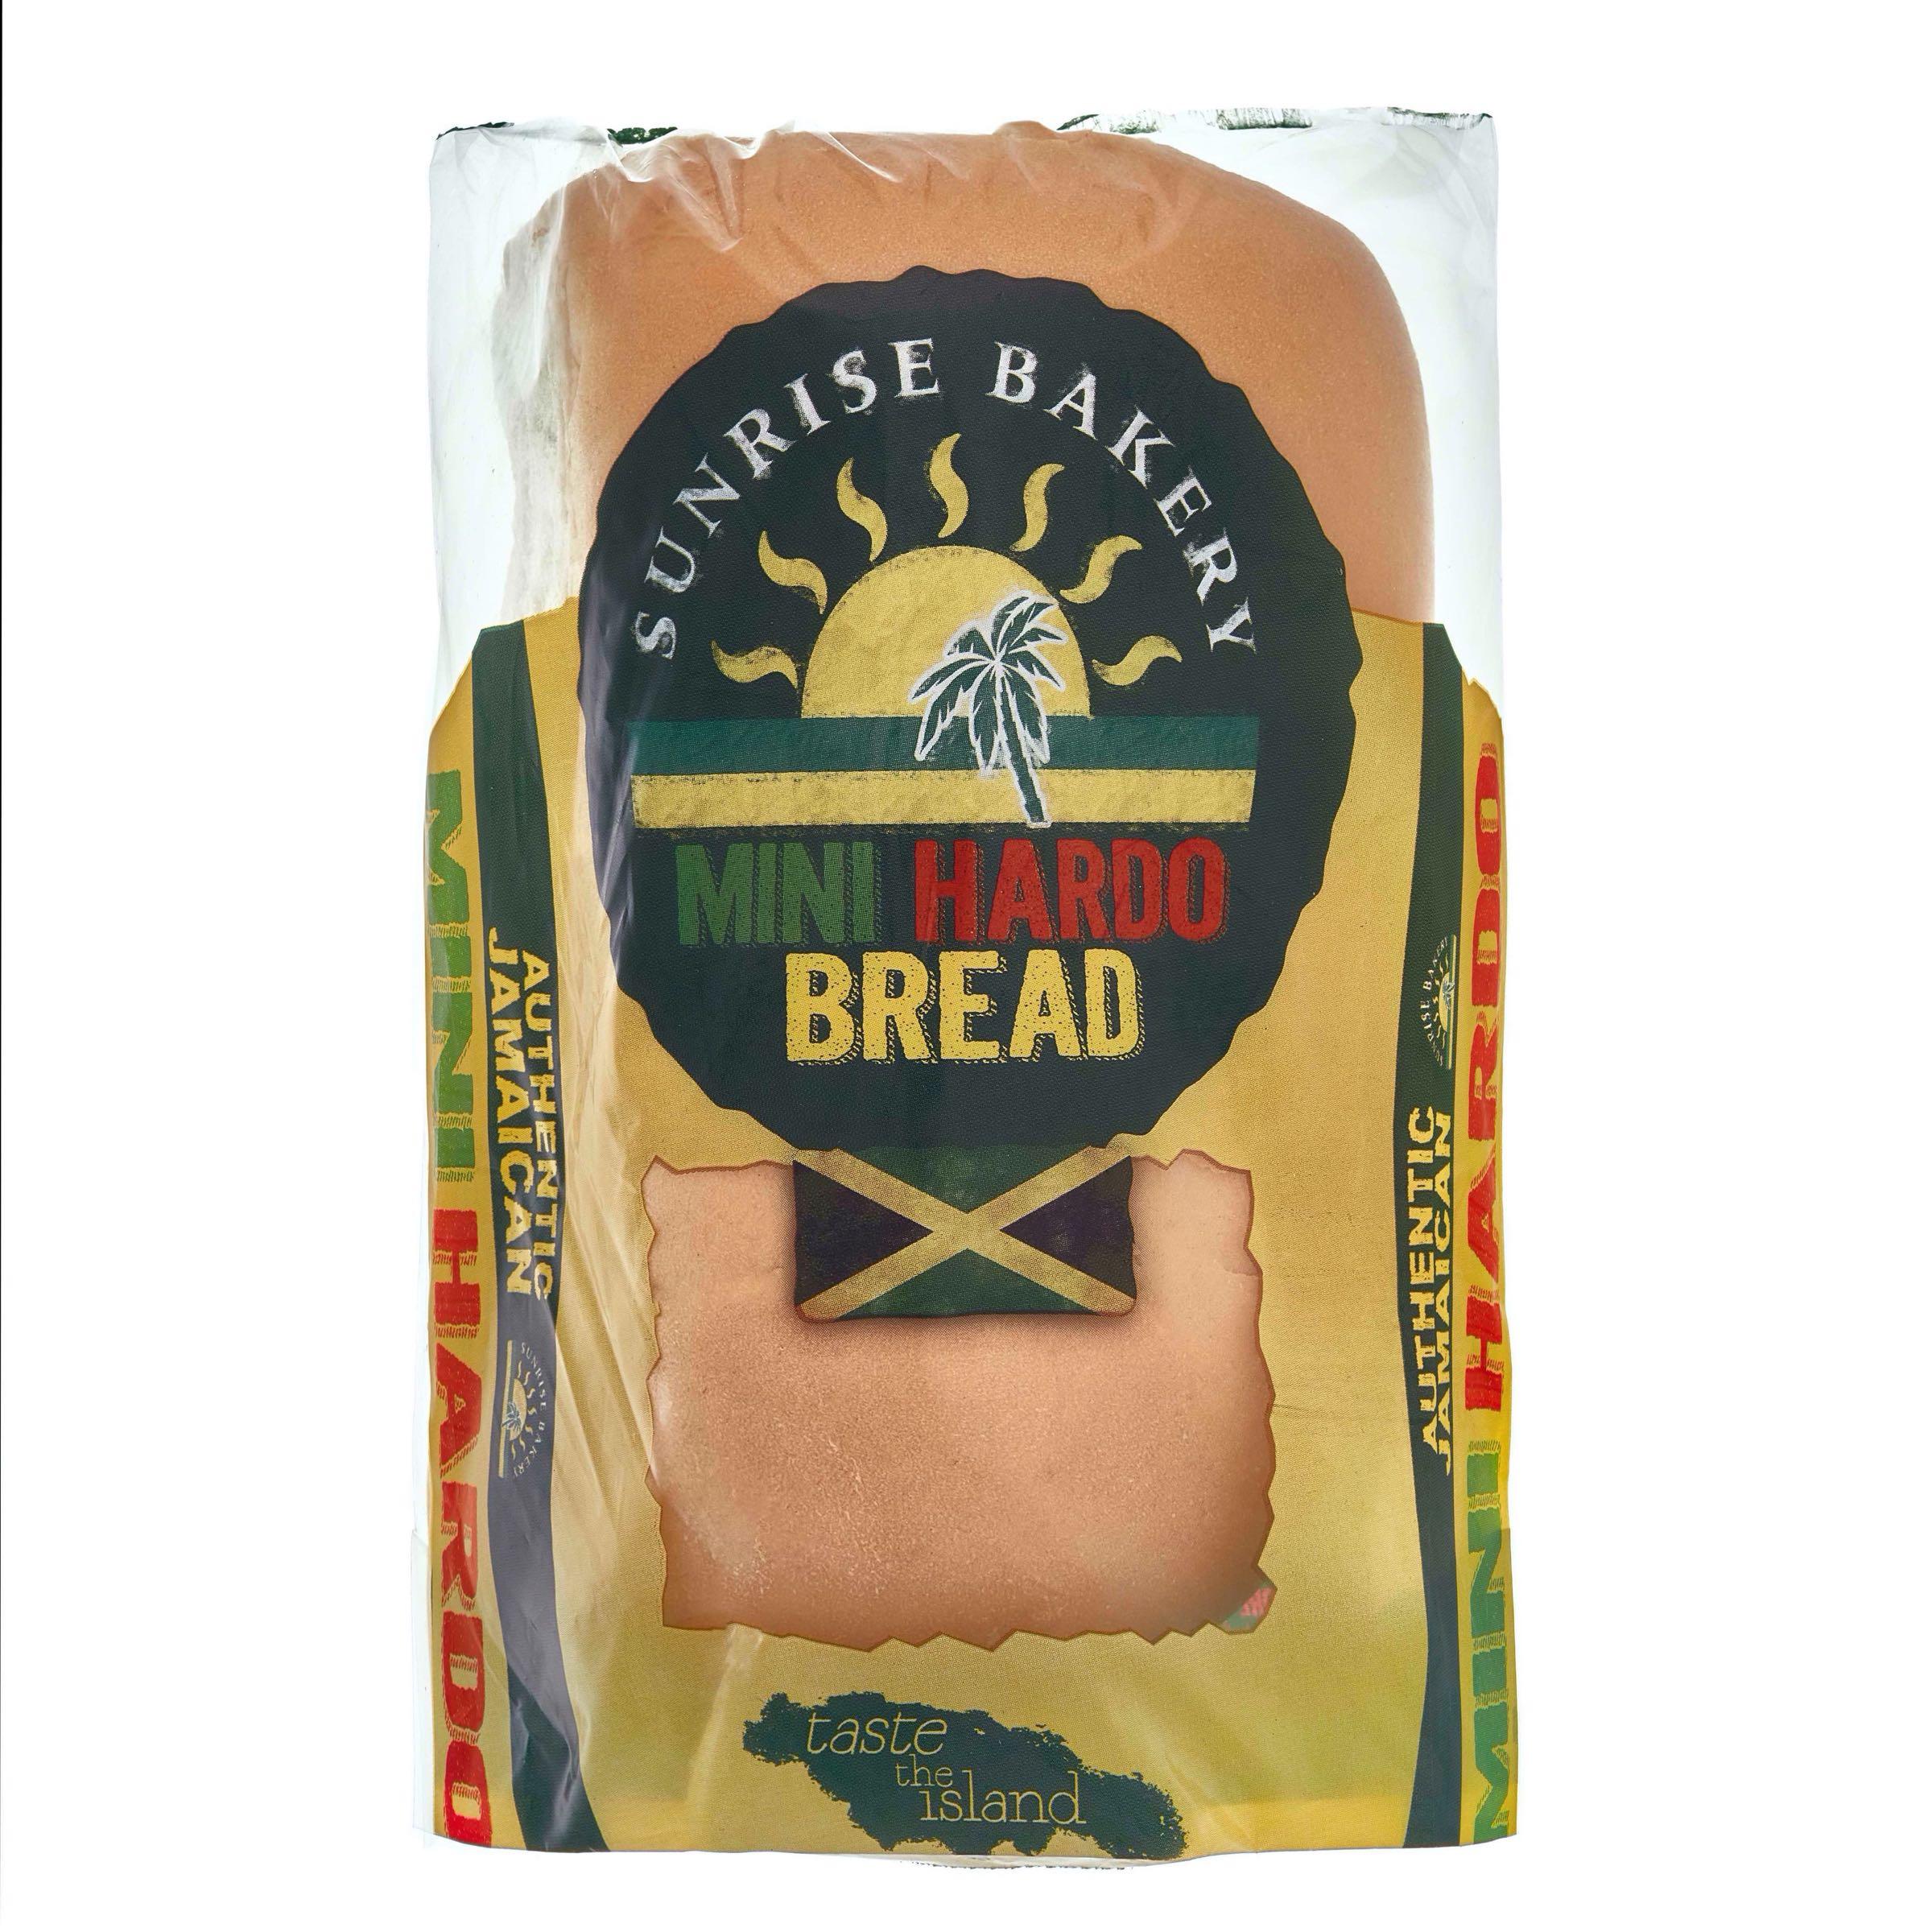 Sunrise Bakery Mini Hardo Bread